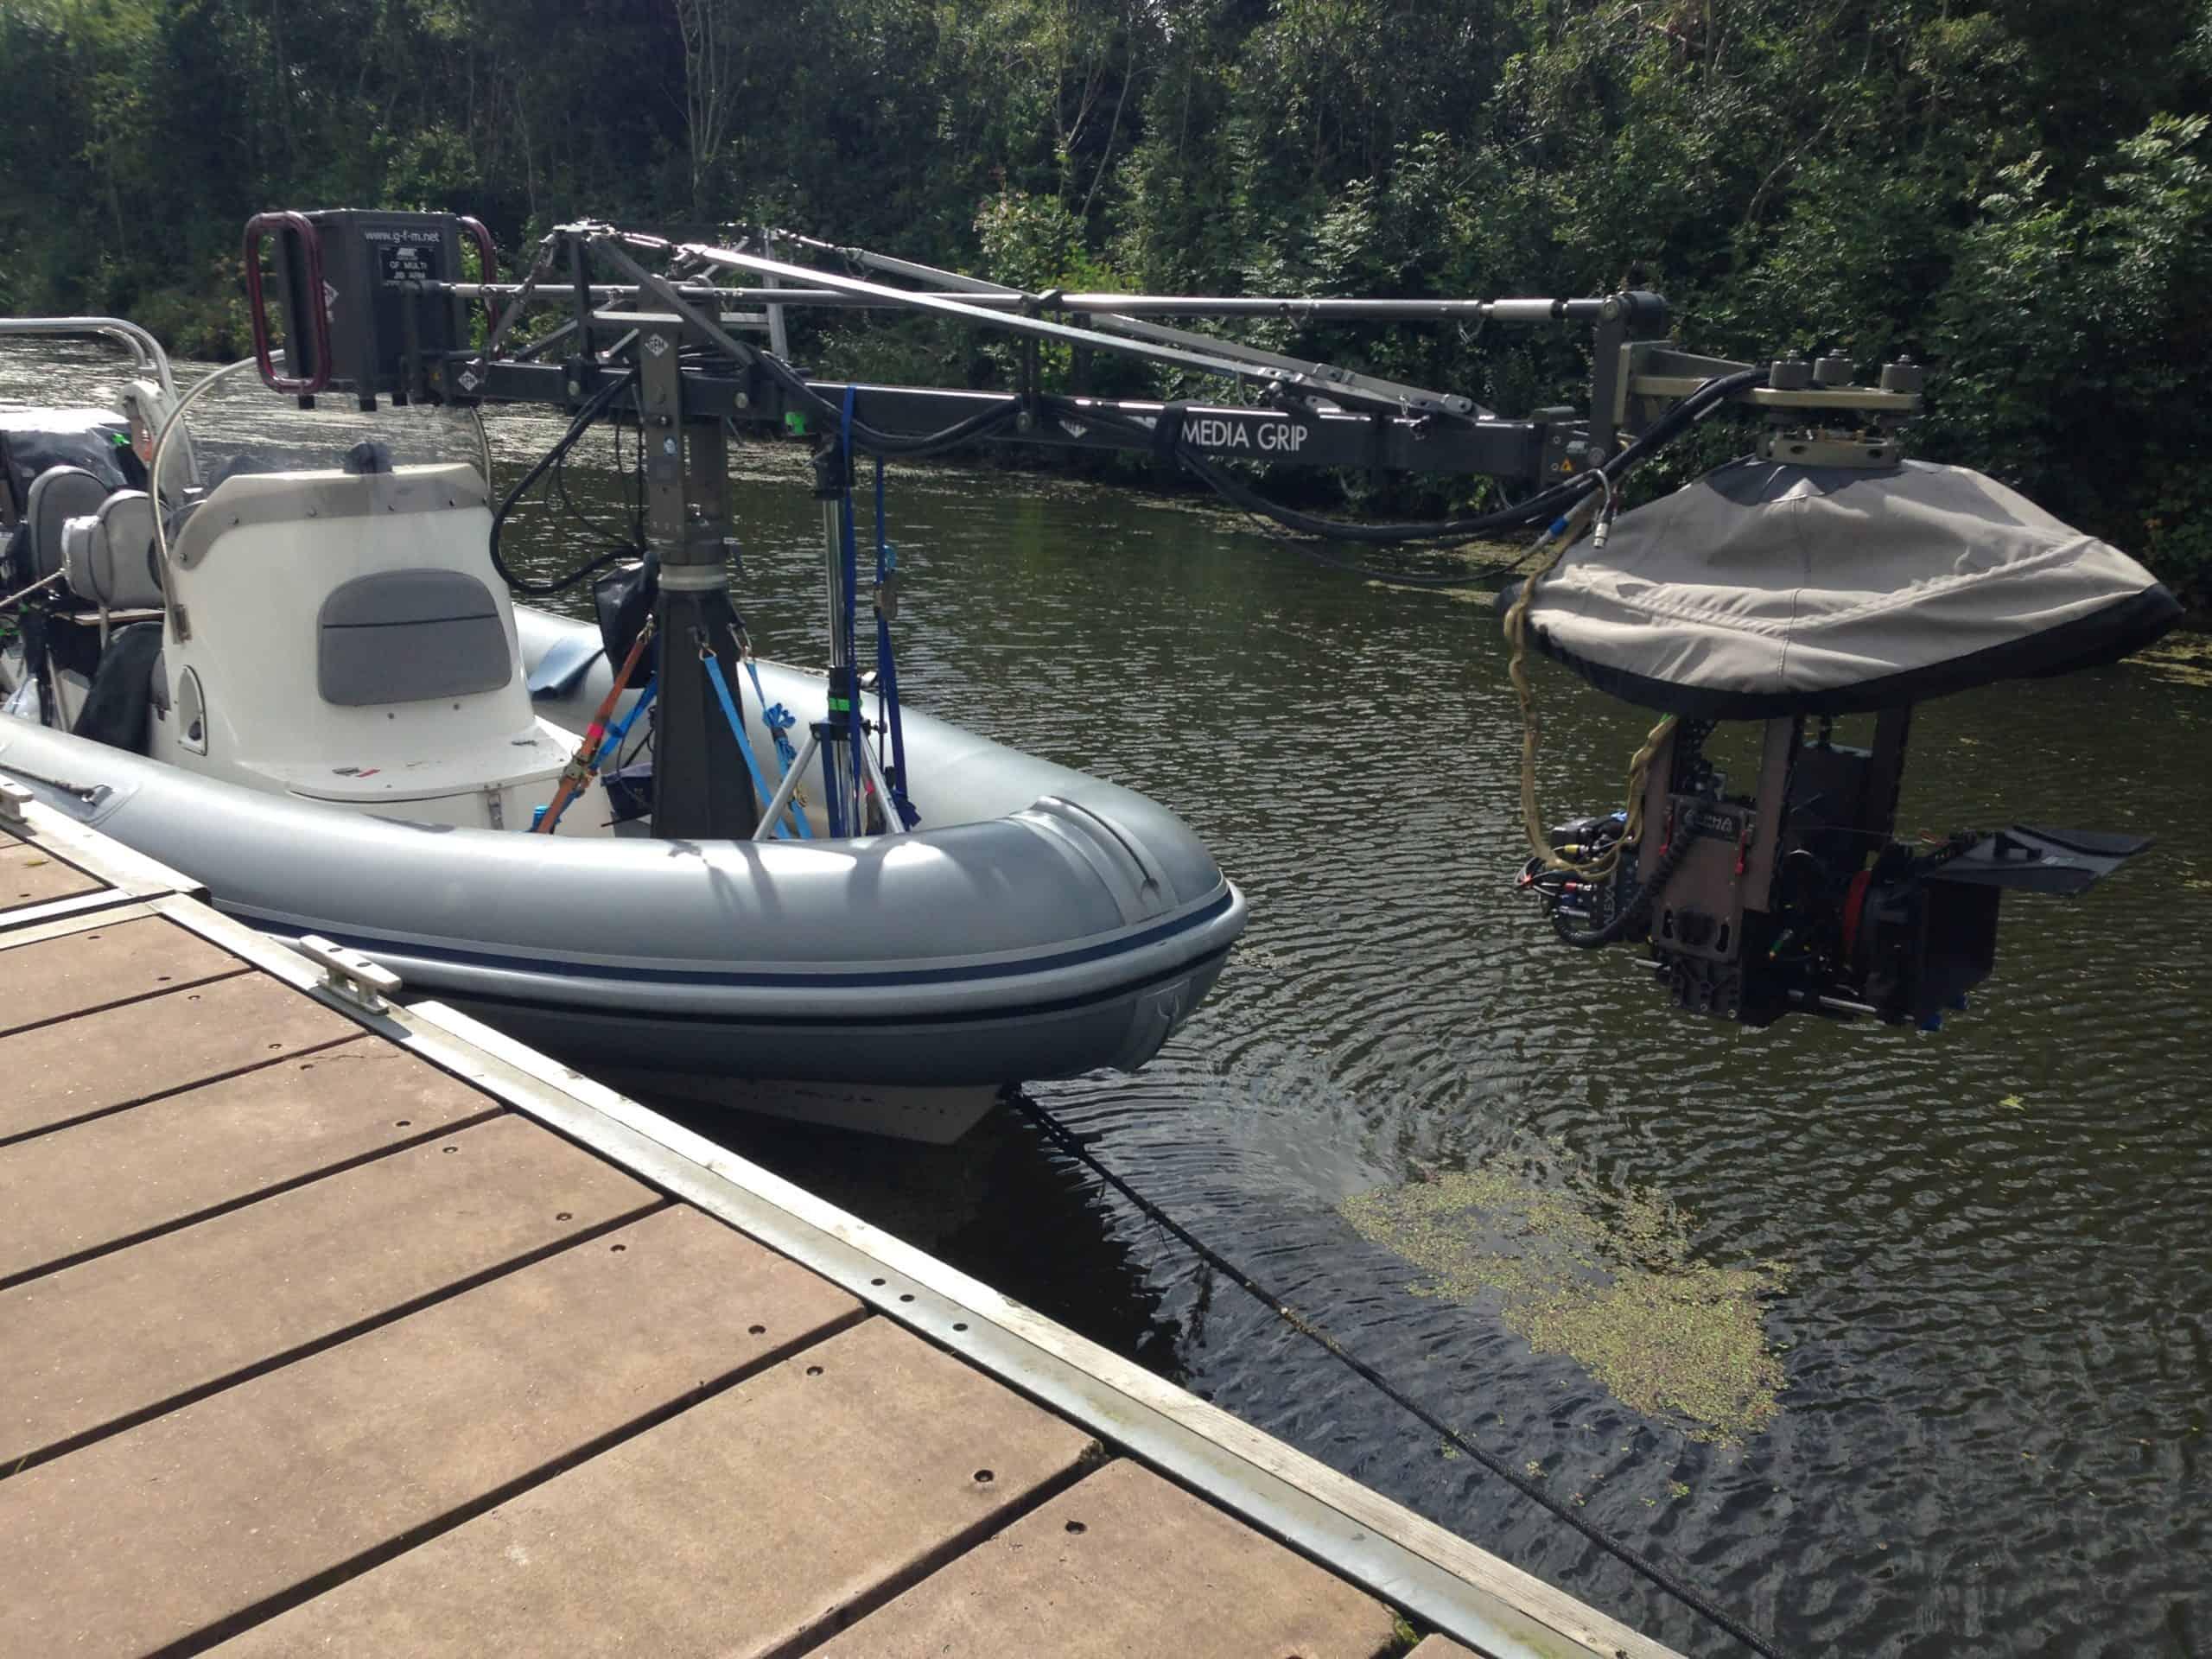 camera boat set for action